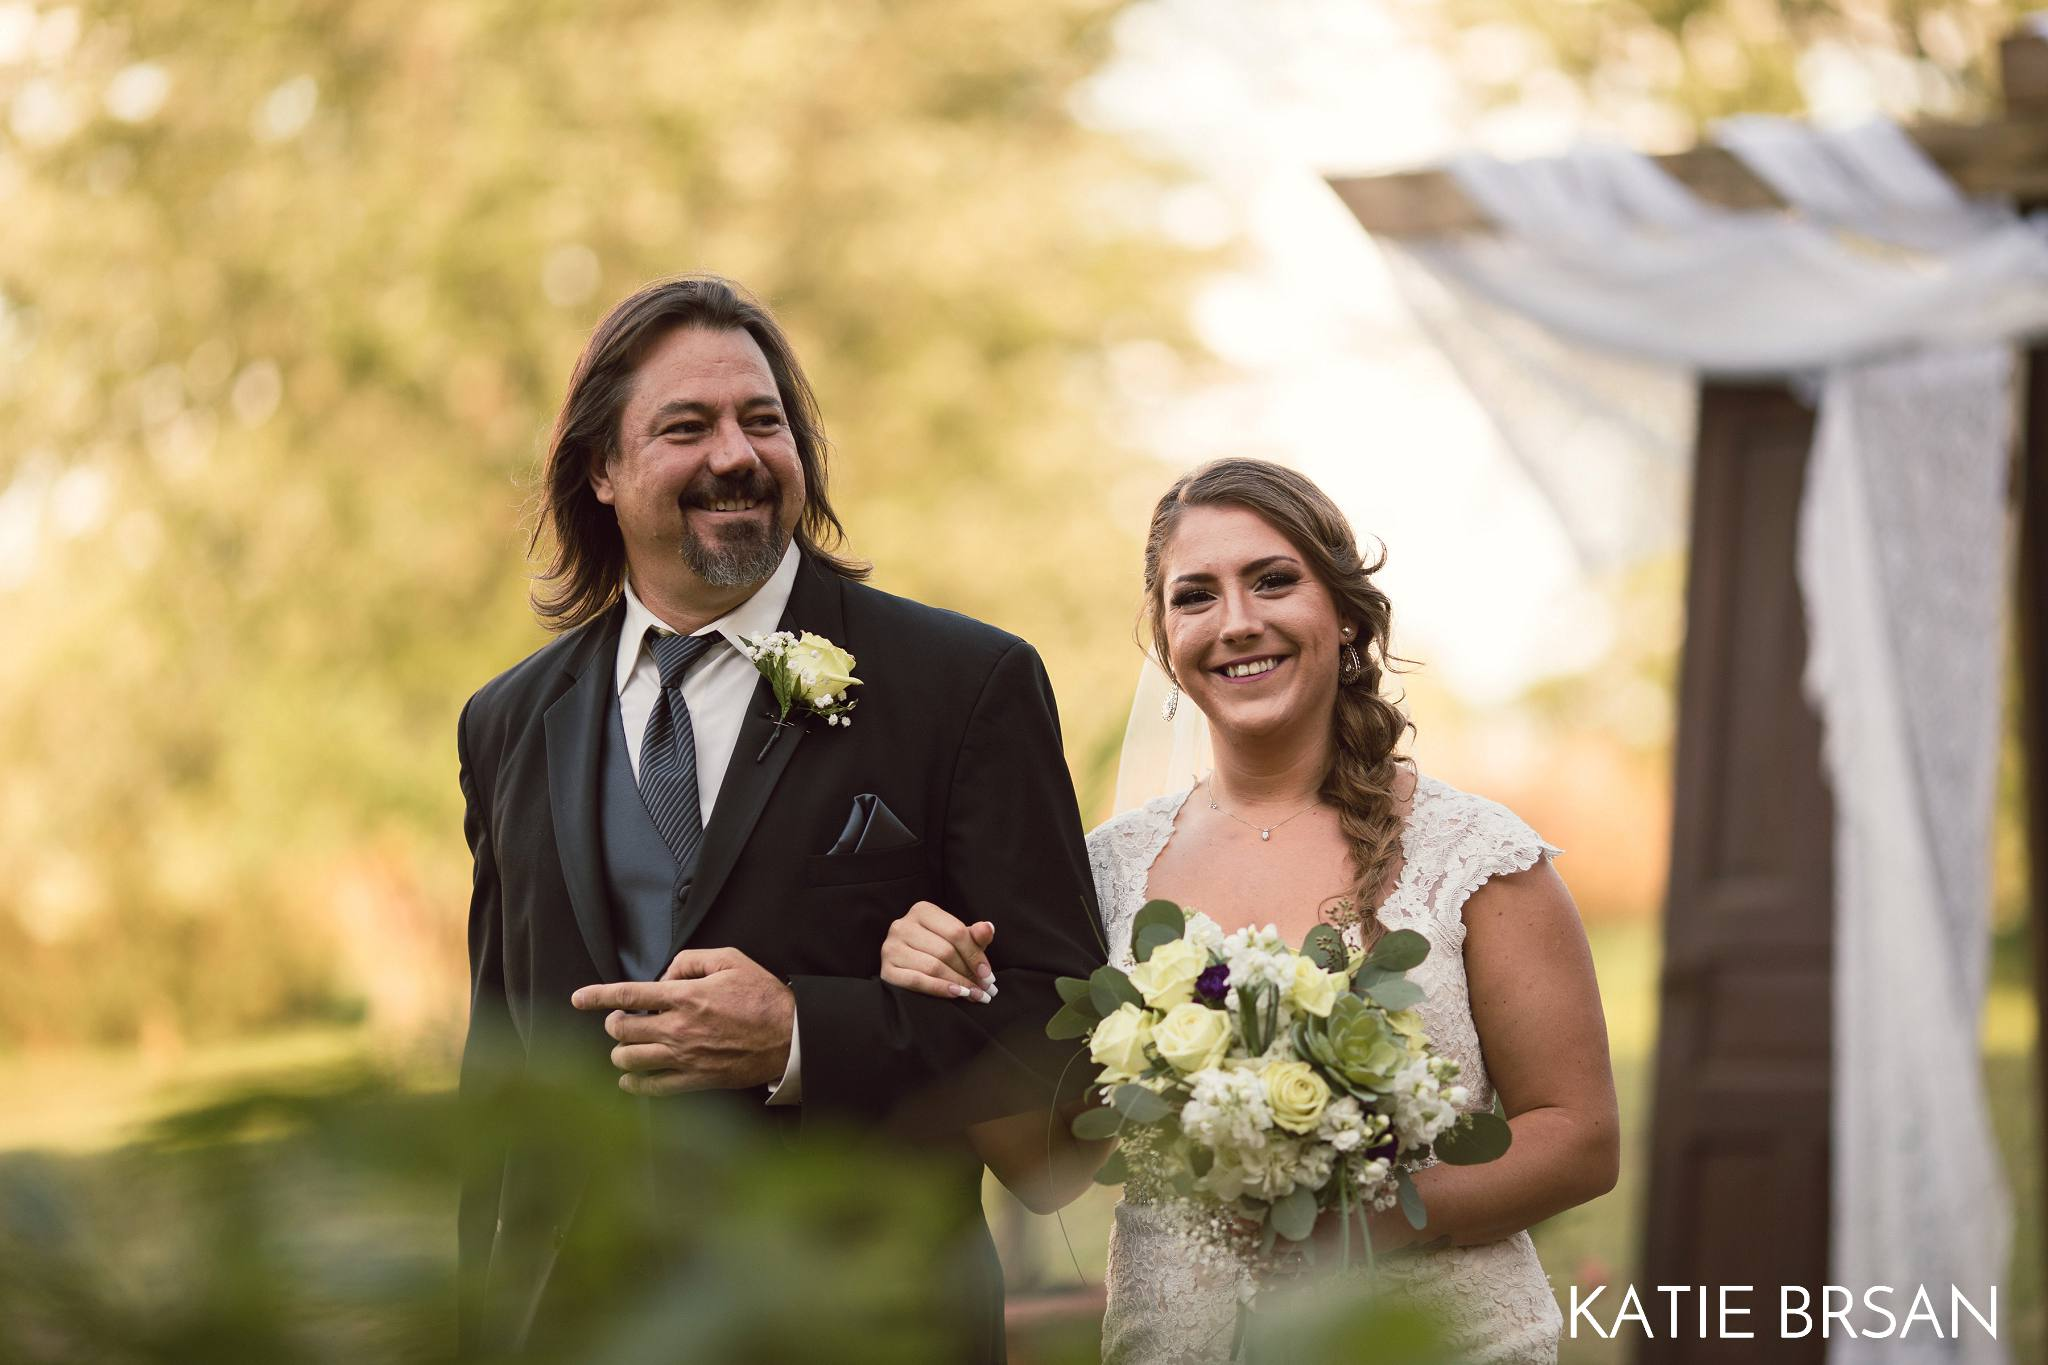 KatieBrsan-Bonfield-Backyard-Wedding_0402.jpg